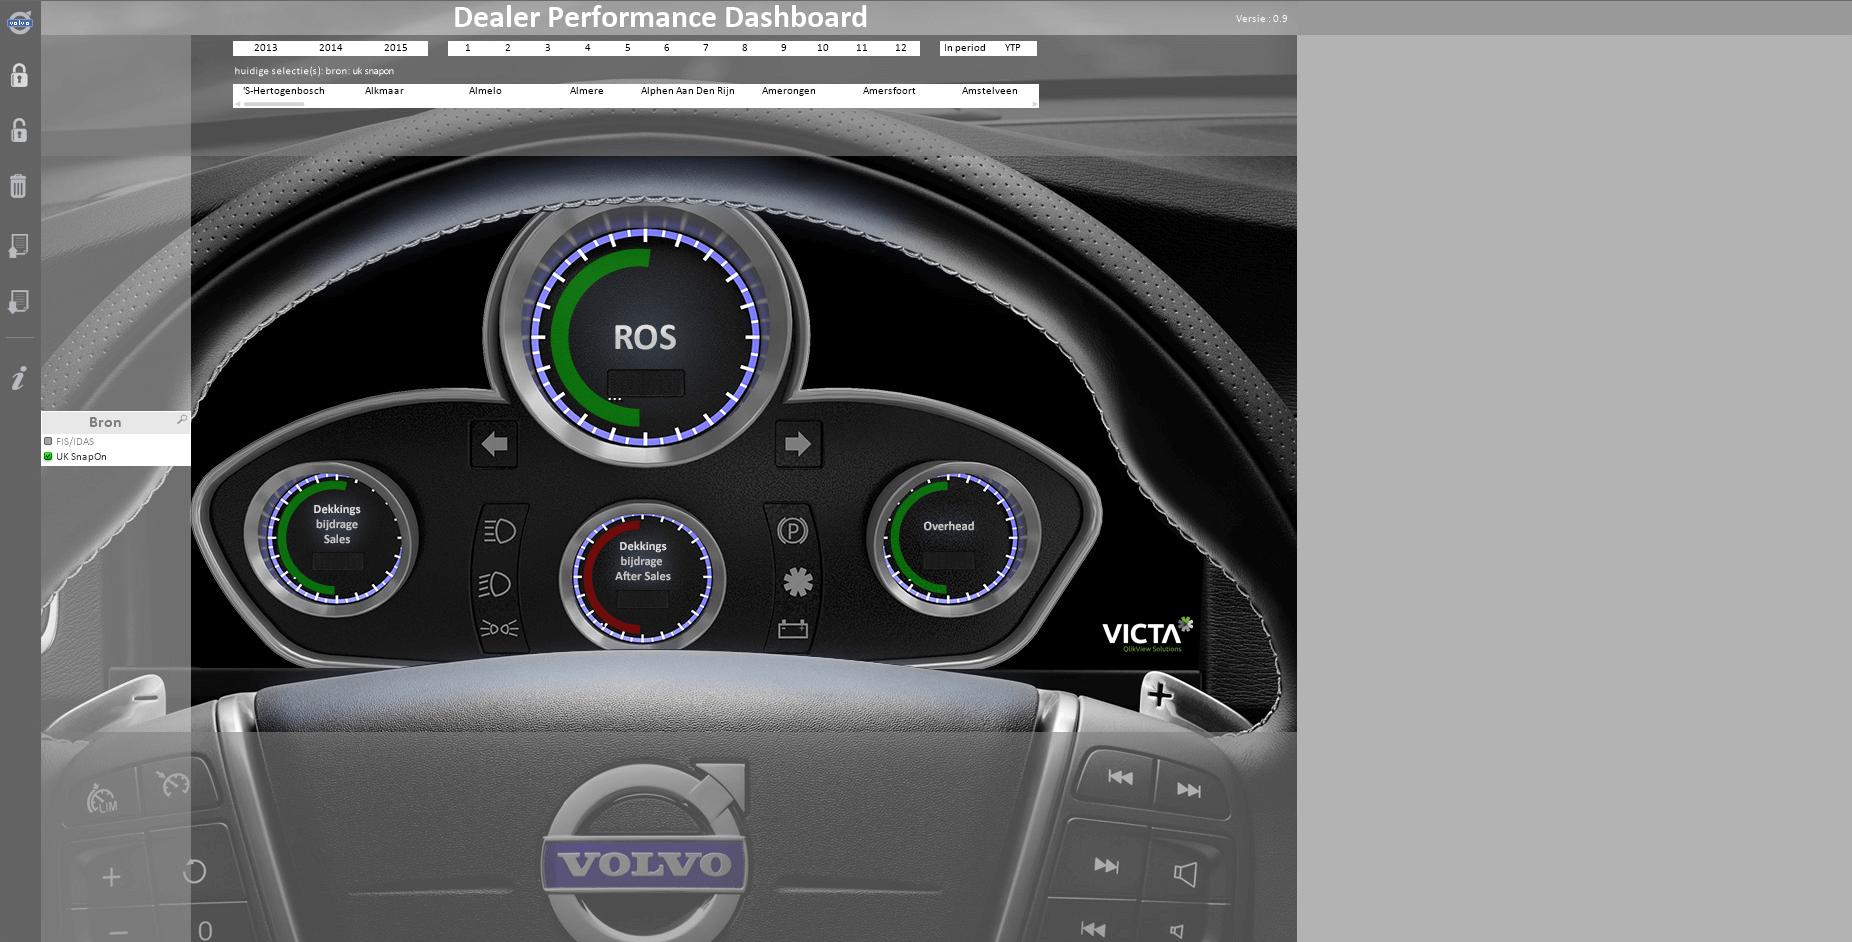 Volvo QlikView Dashboard